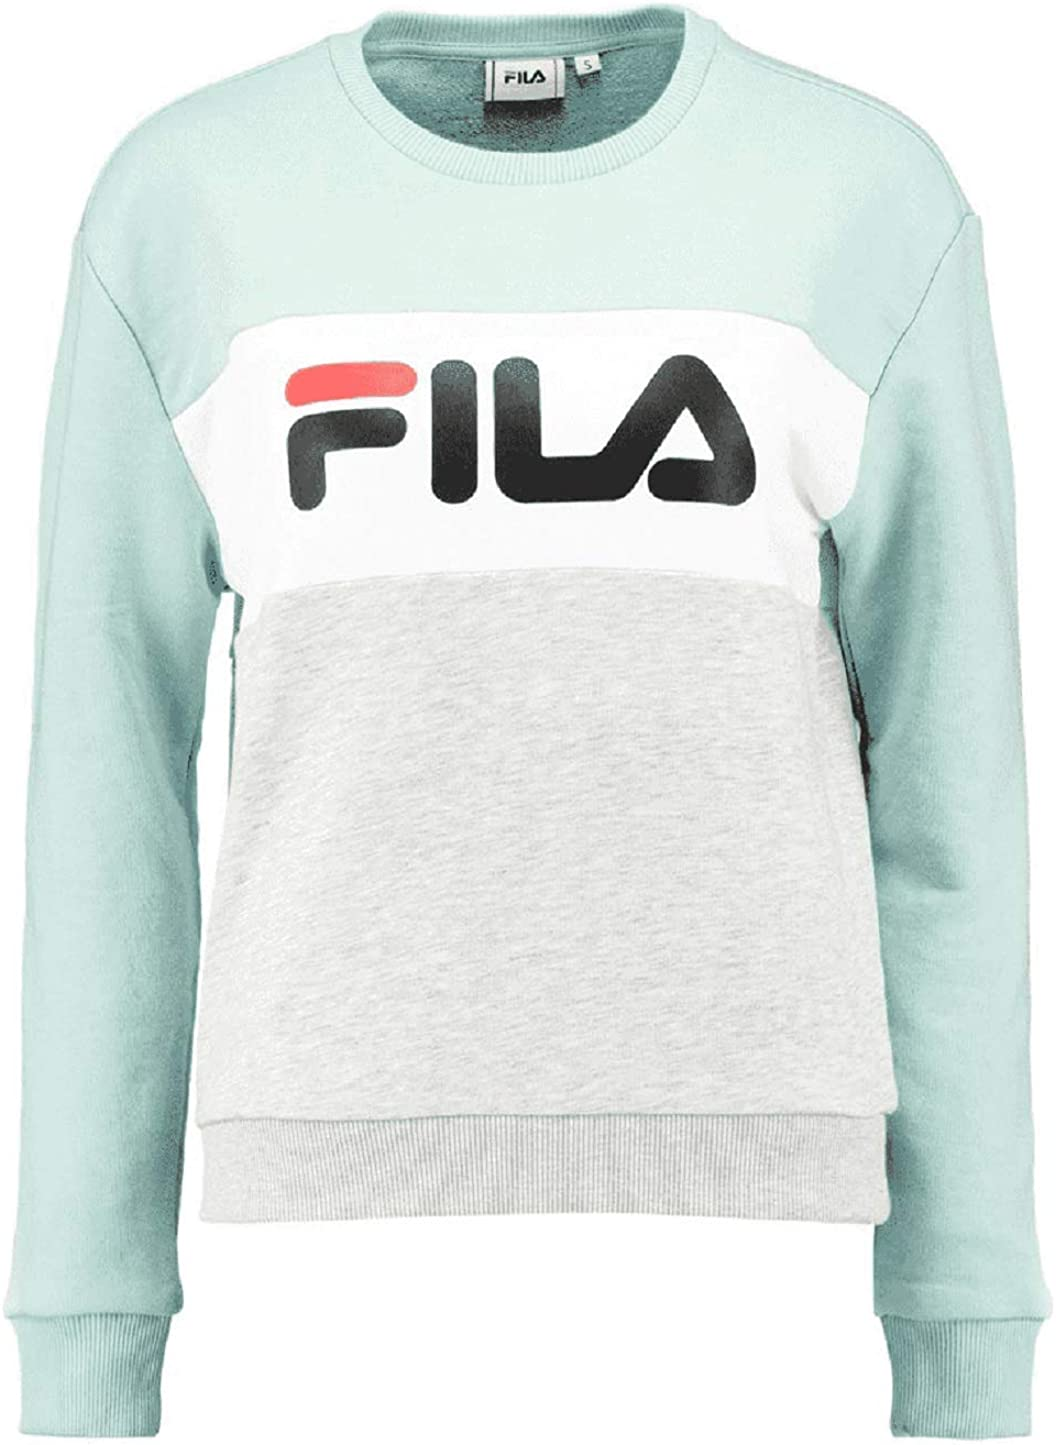 Fila Urban Line Leah Women Sweater (M, Light GreyGreen